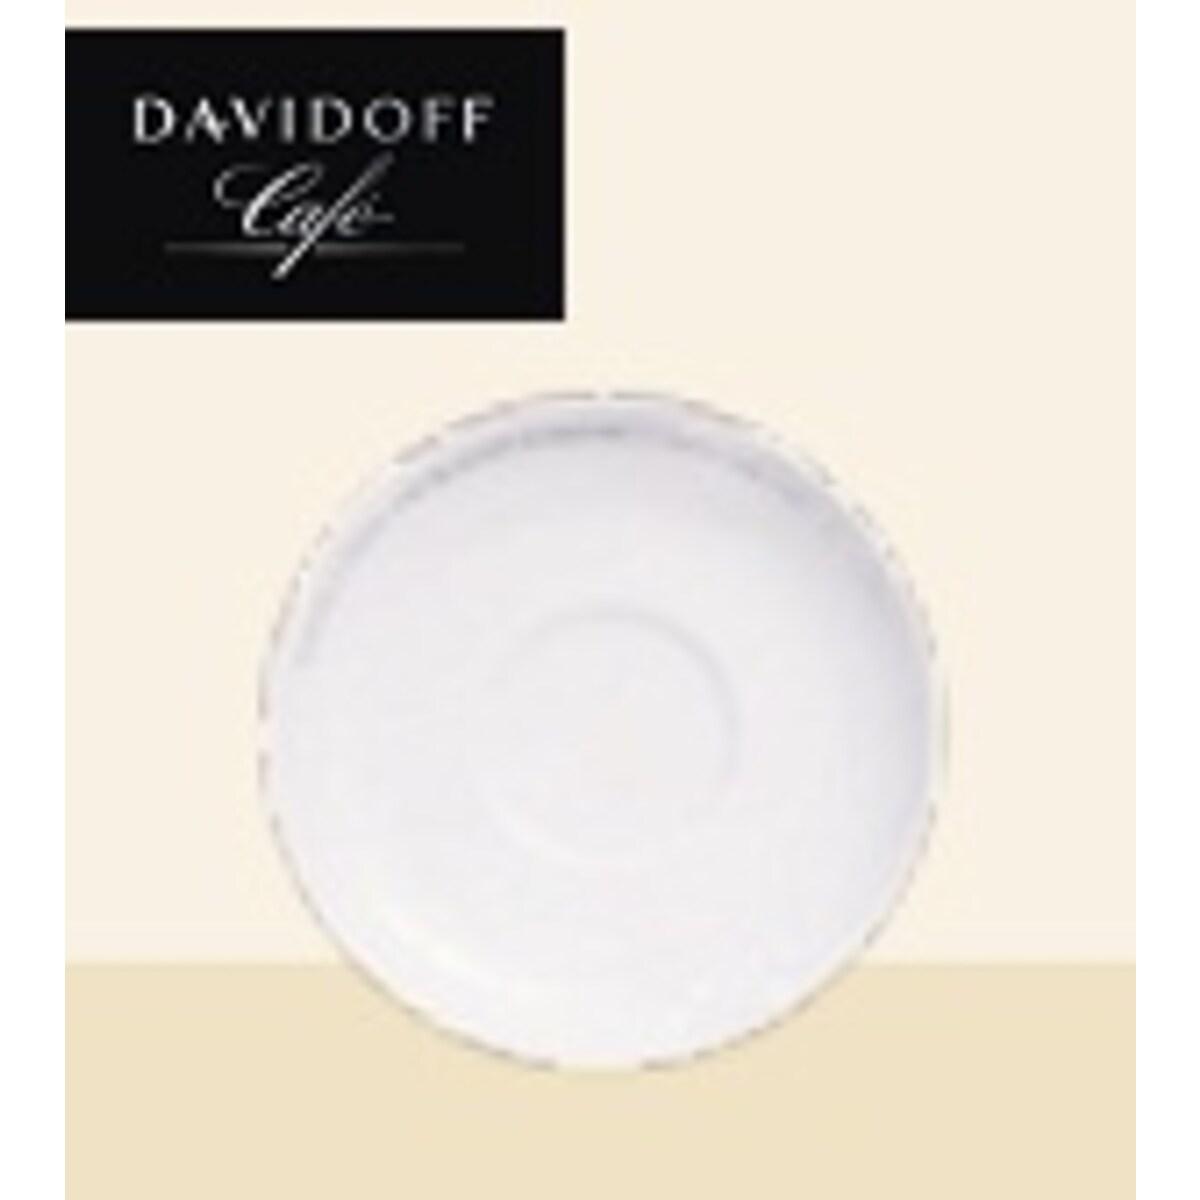 Tchibo Davidoff - комплект чинийки за еспресо, 6 бр